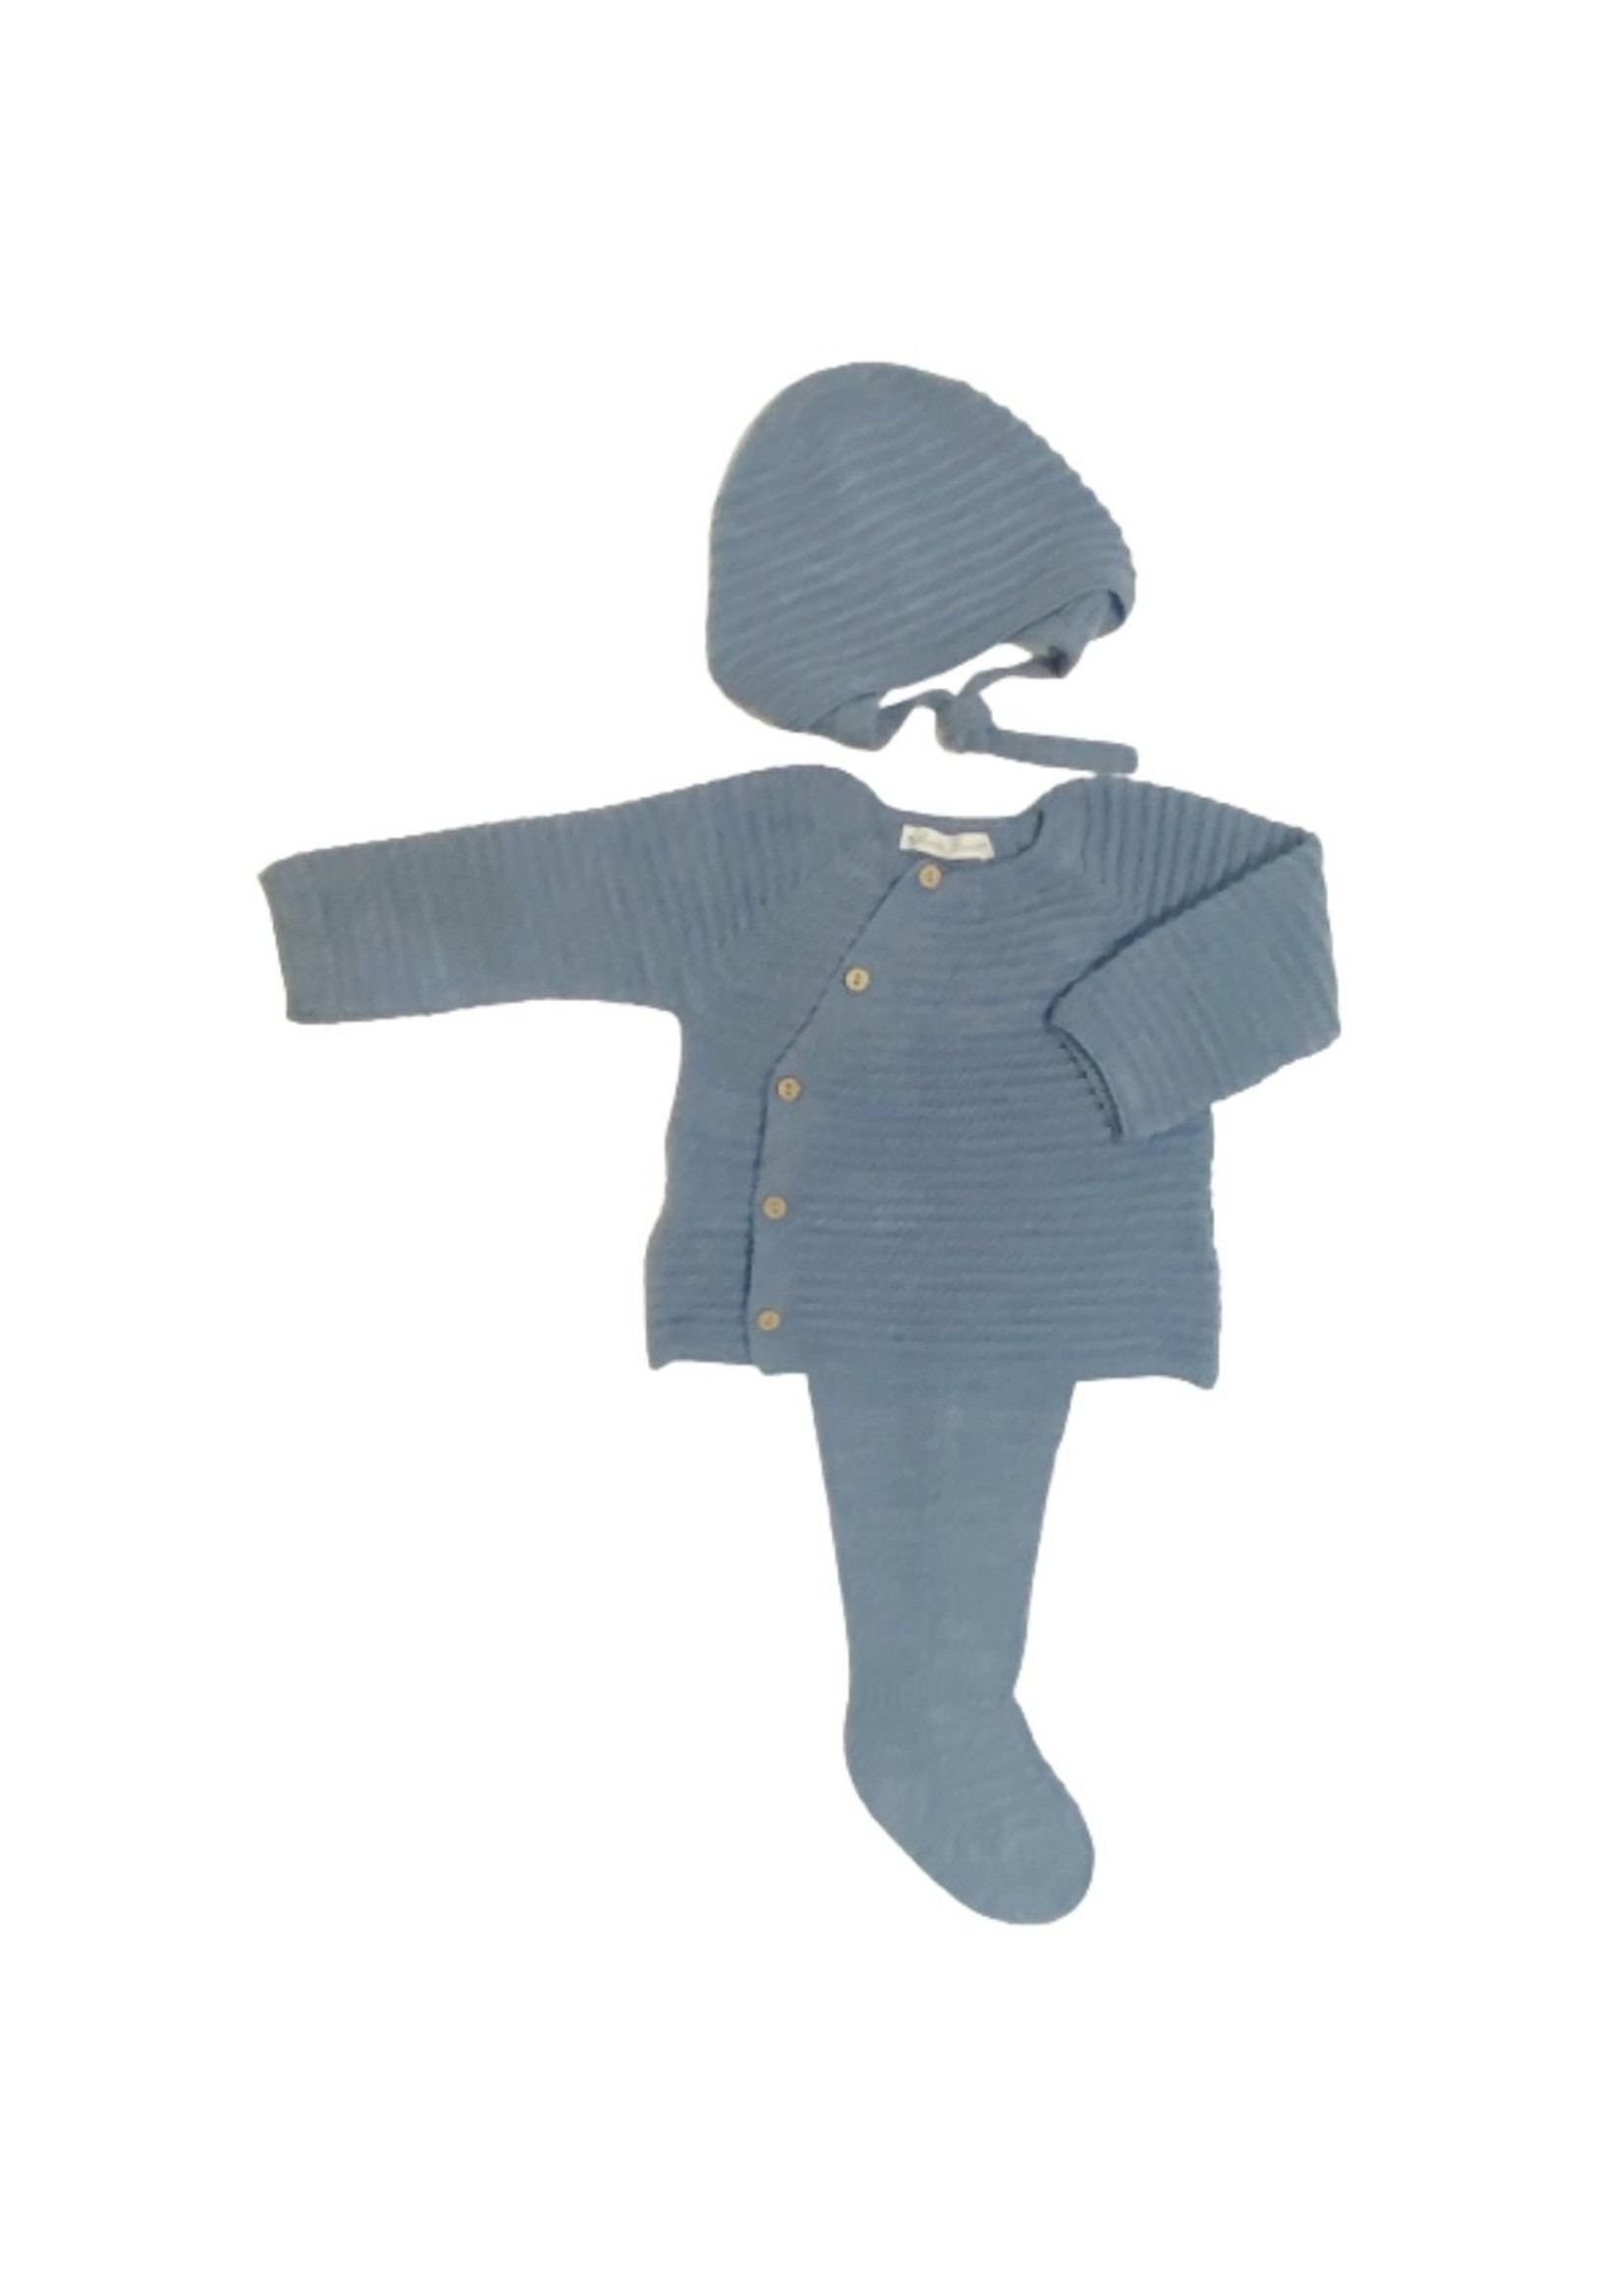 Blue Knit Sweater Legging and Bonnet Set